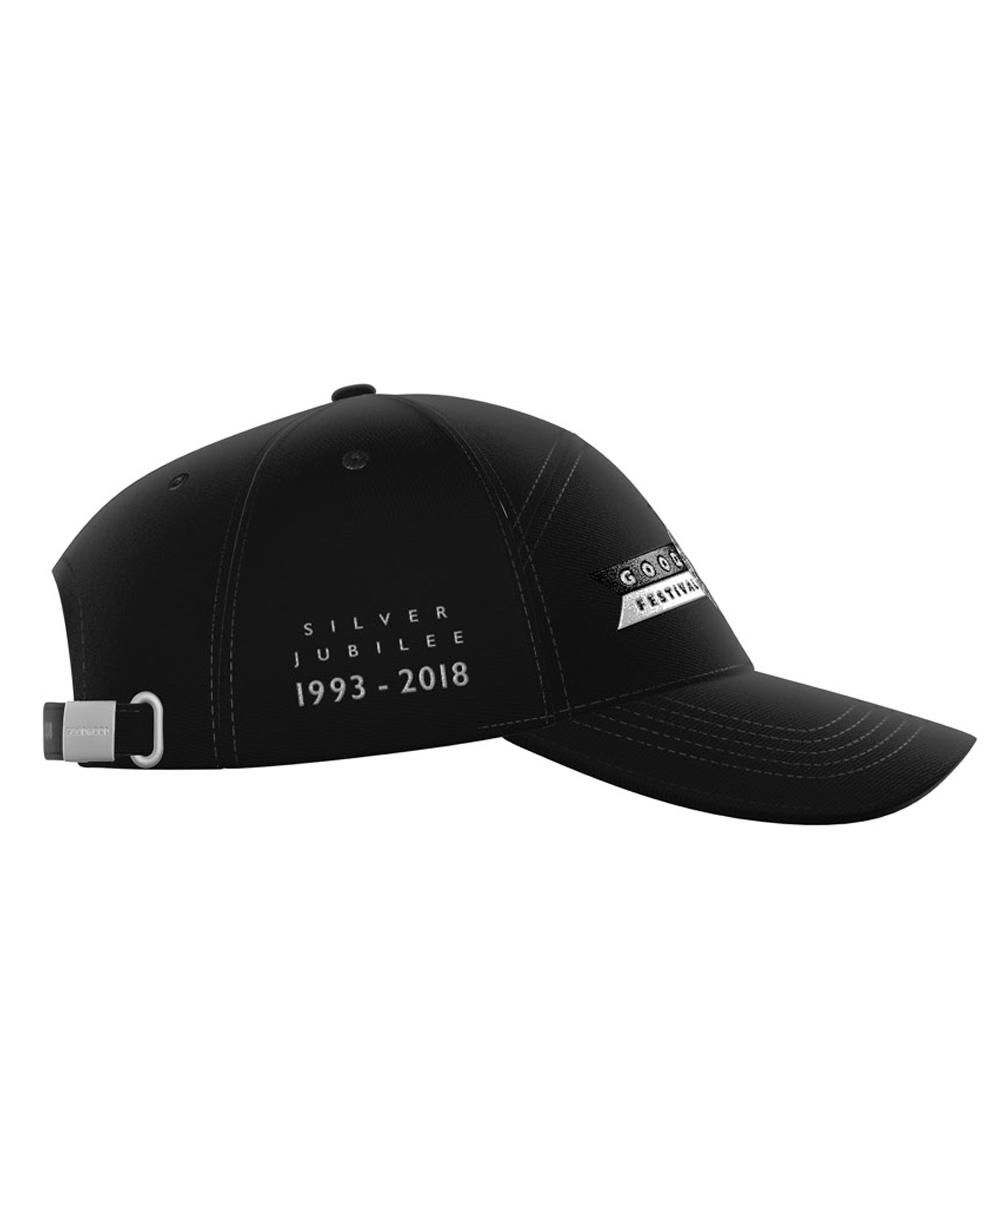 397622c09d6 Product Title - Festival of Speed 2018 Porsche Baseball Cap Black